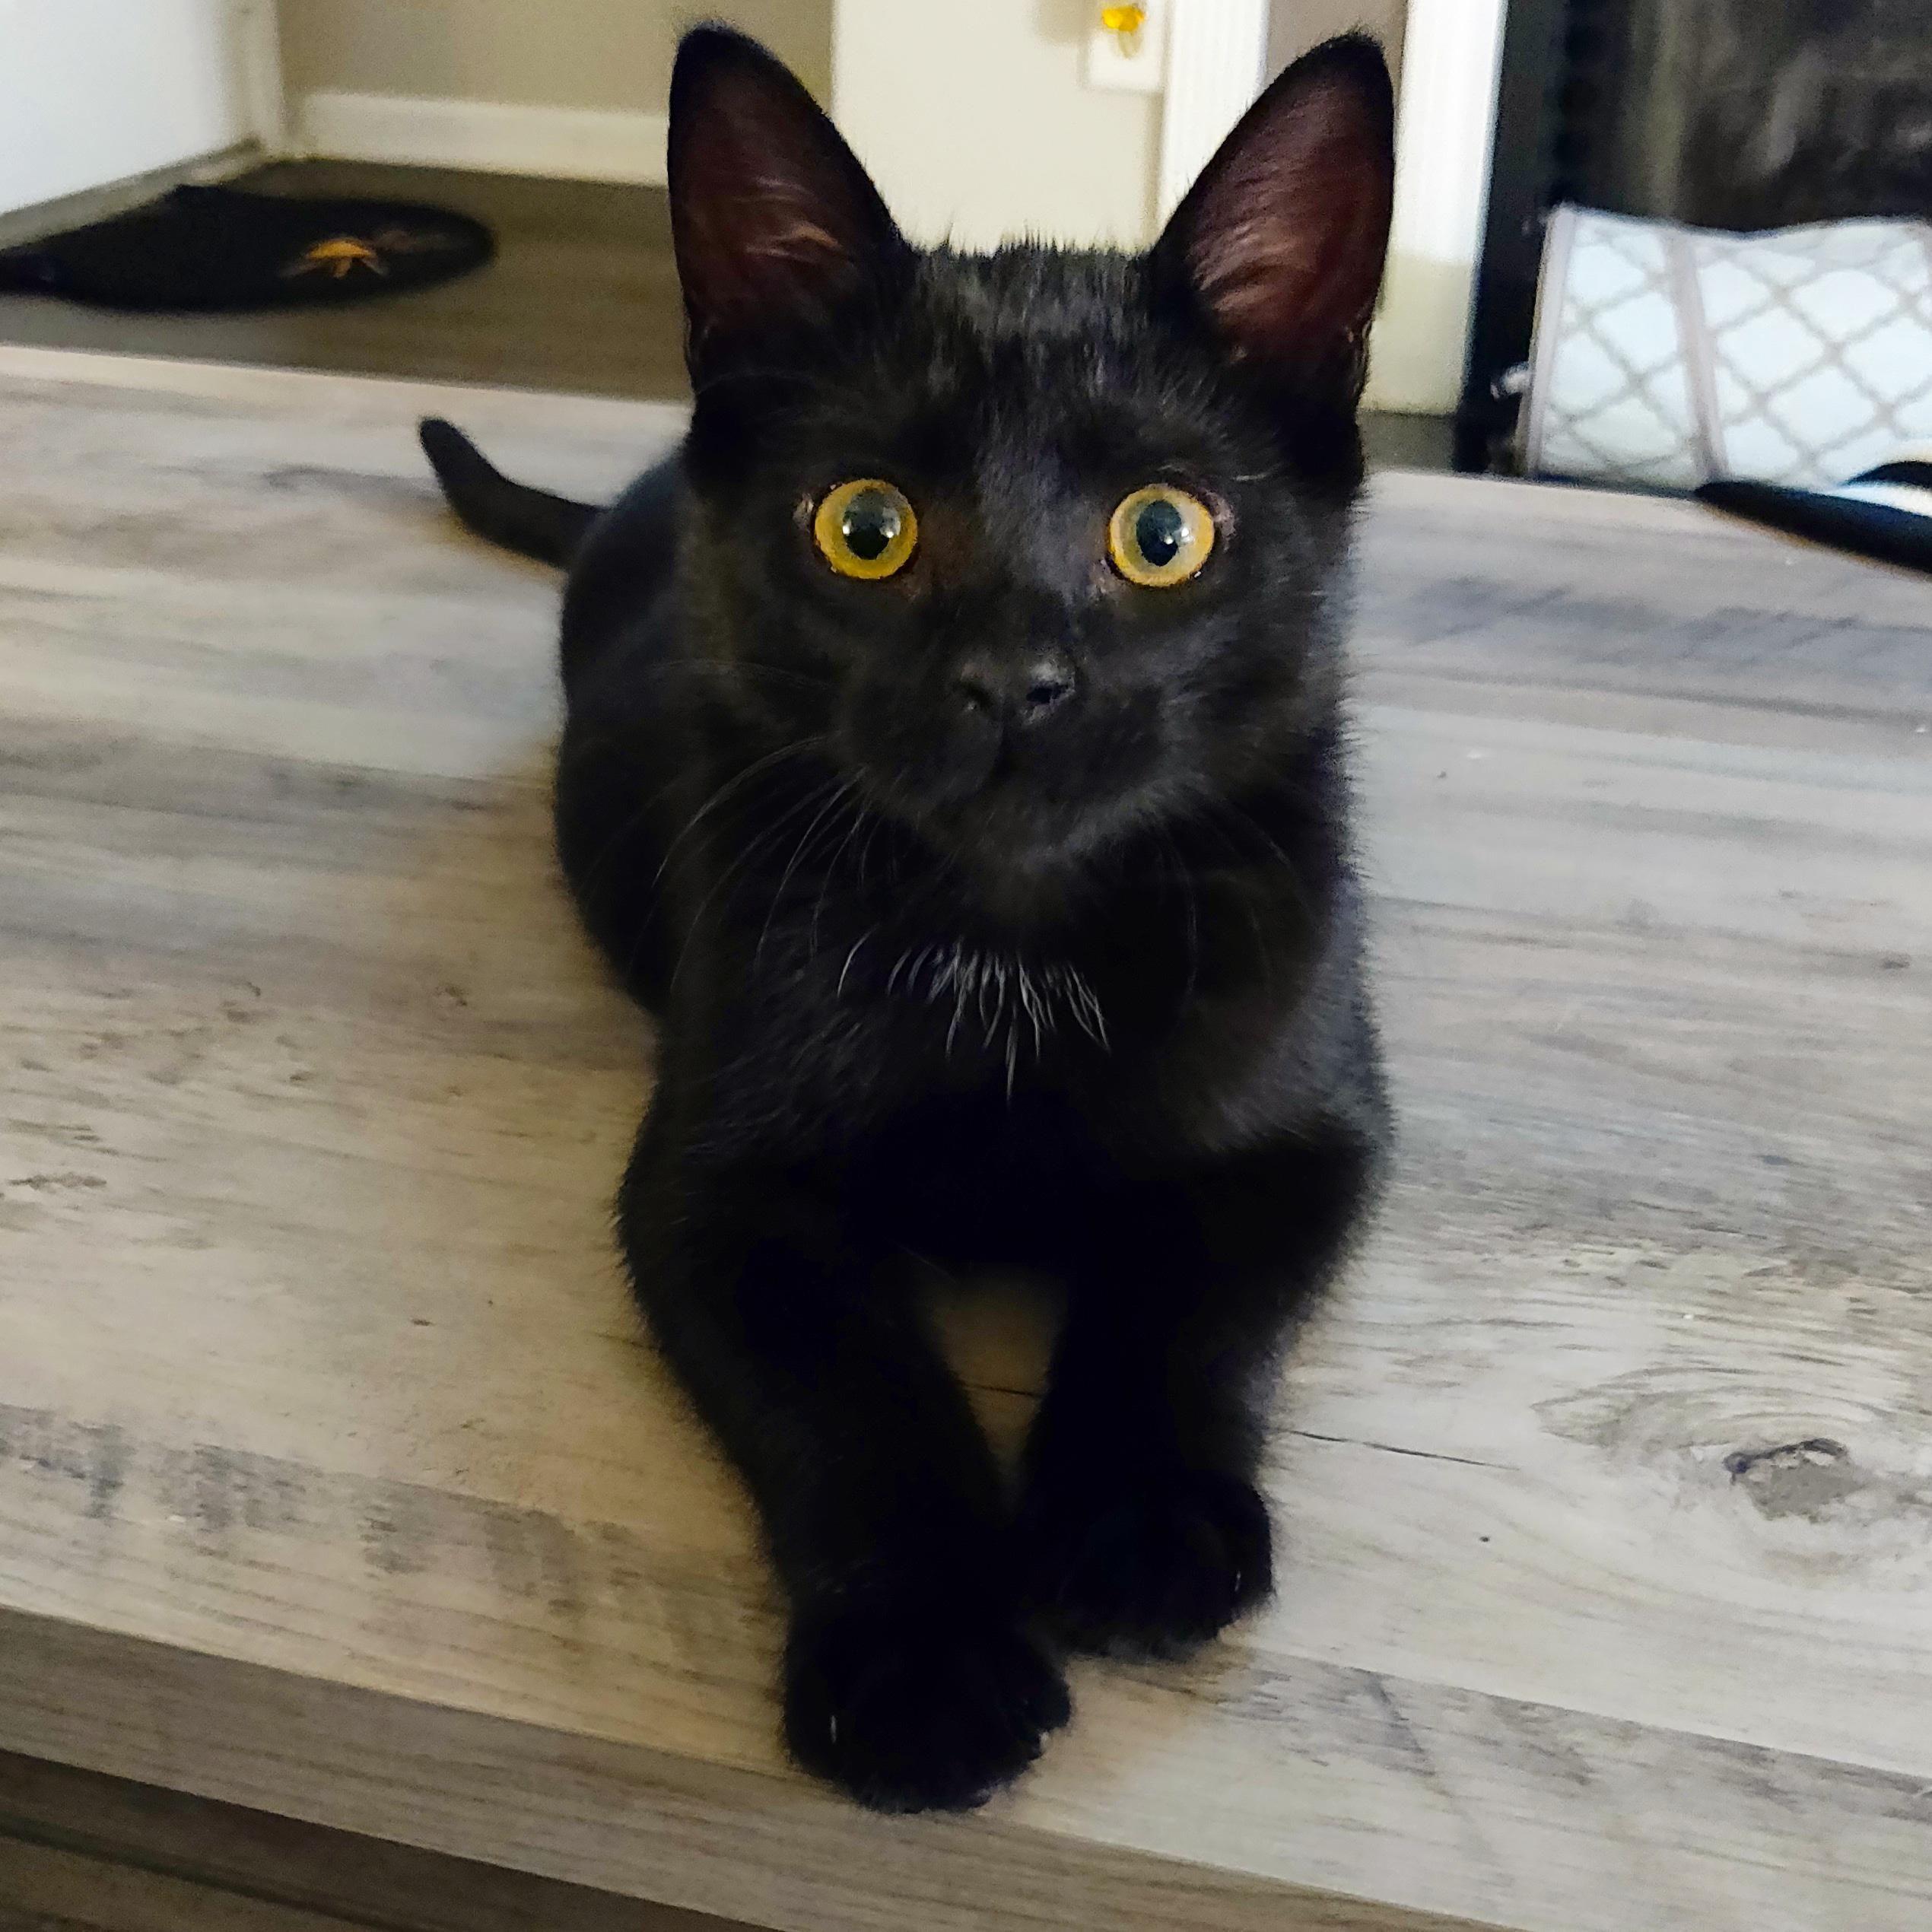 My Kitten Batz Cute Black Kitten Cats And Kittens I Love Cats